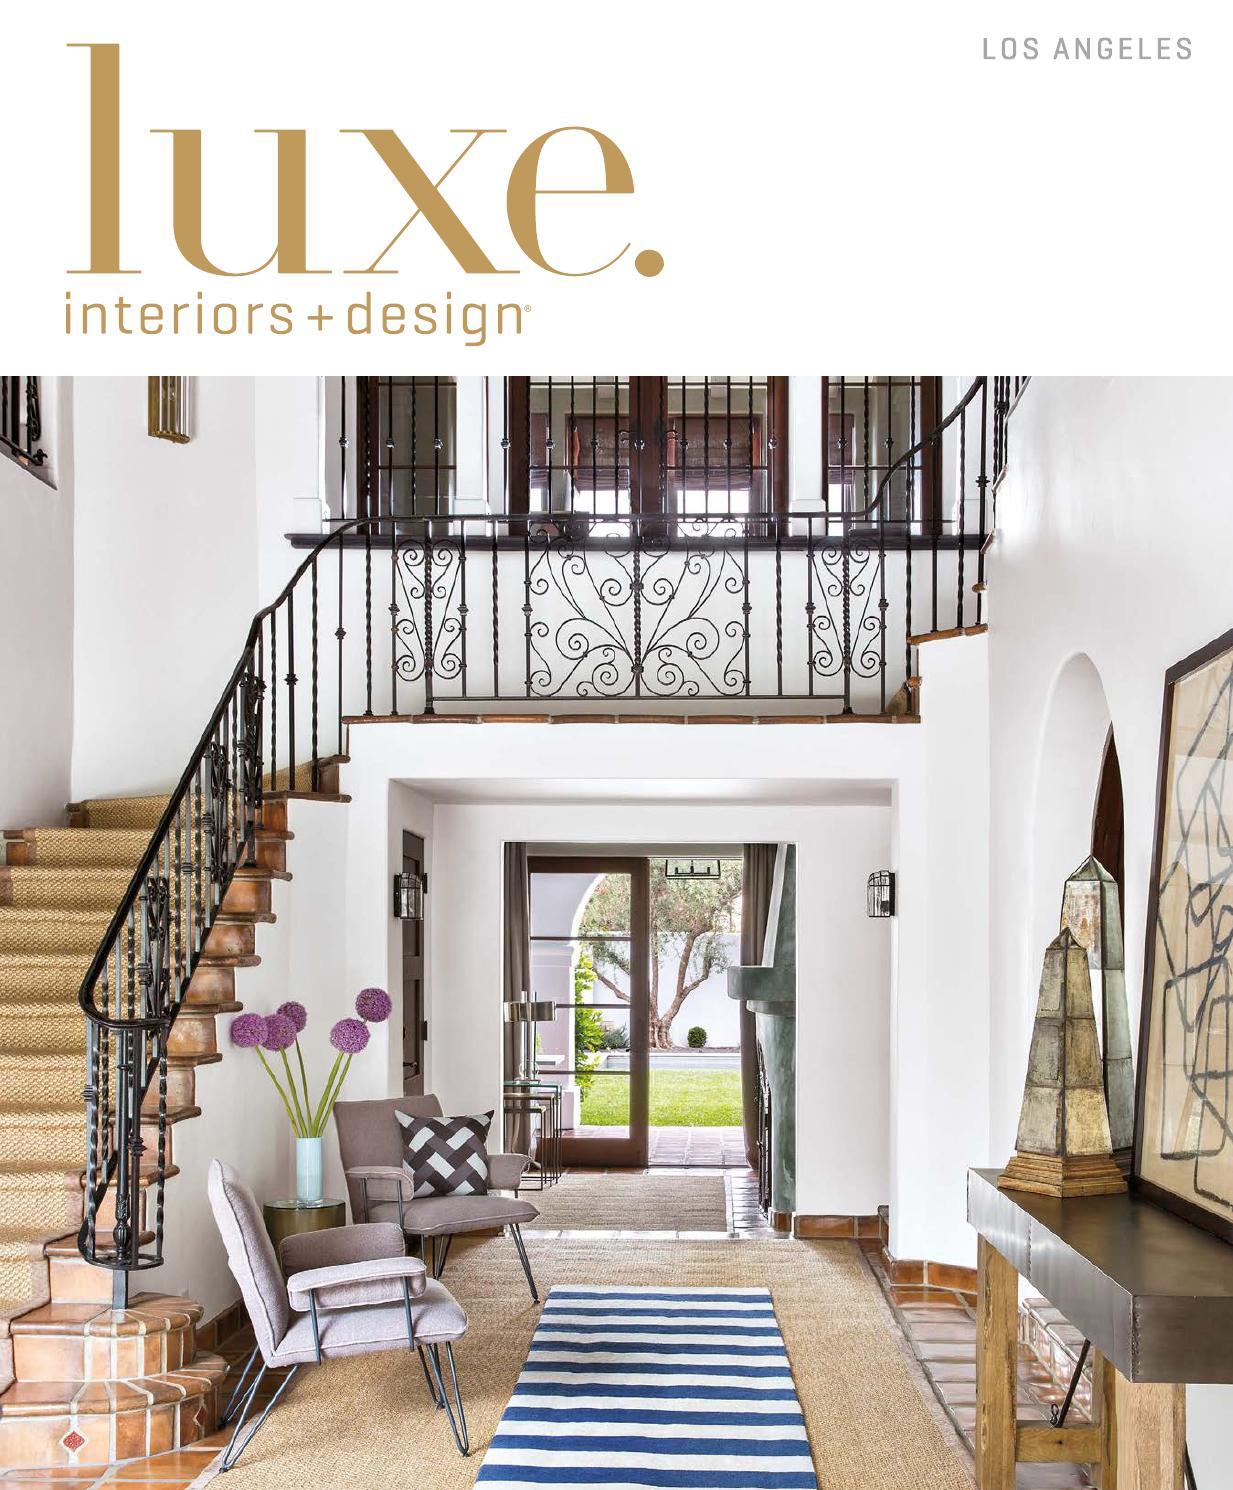 Luxe magazine september 2015 los angeles by sandow media - Houston interior design magazine ...